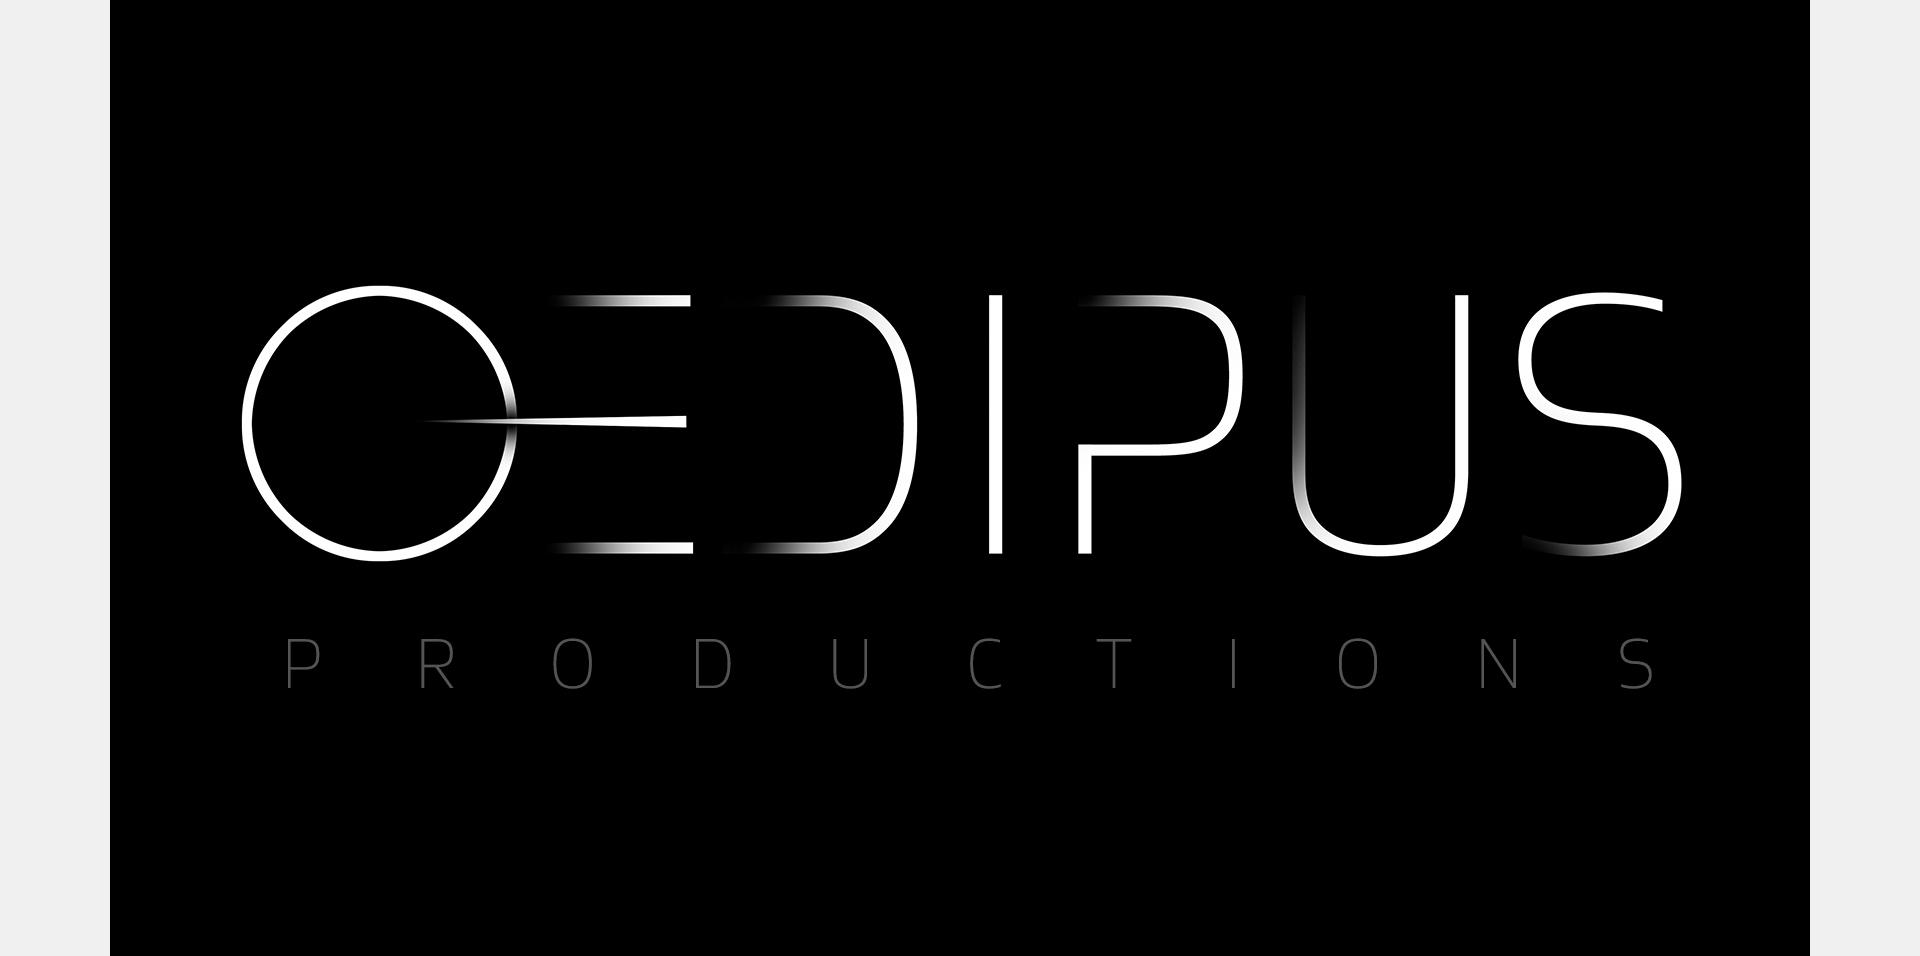 Oedipus-logo-thin@2x.jpg